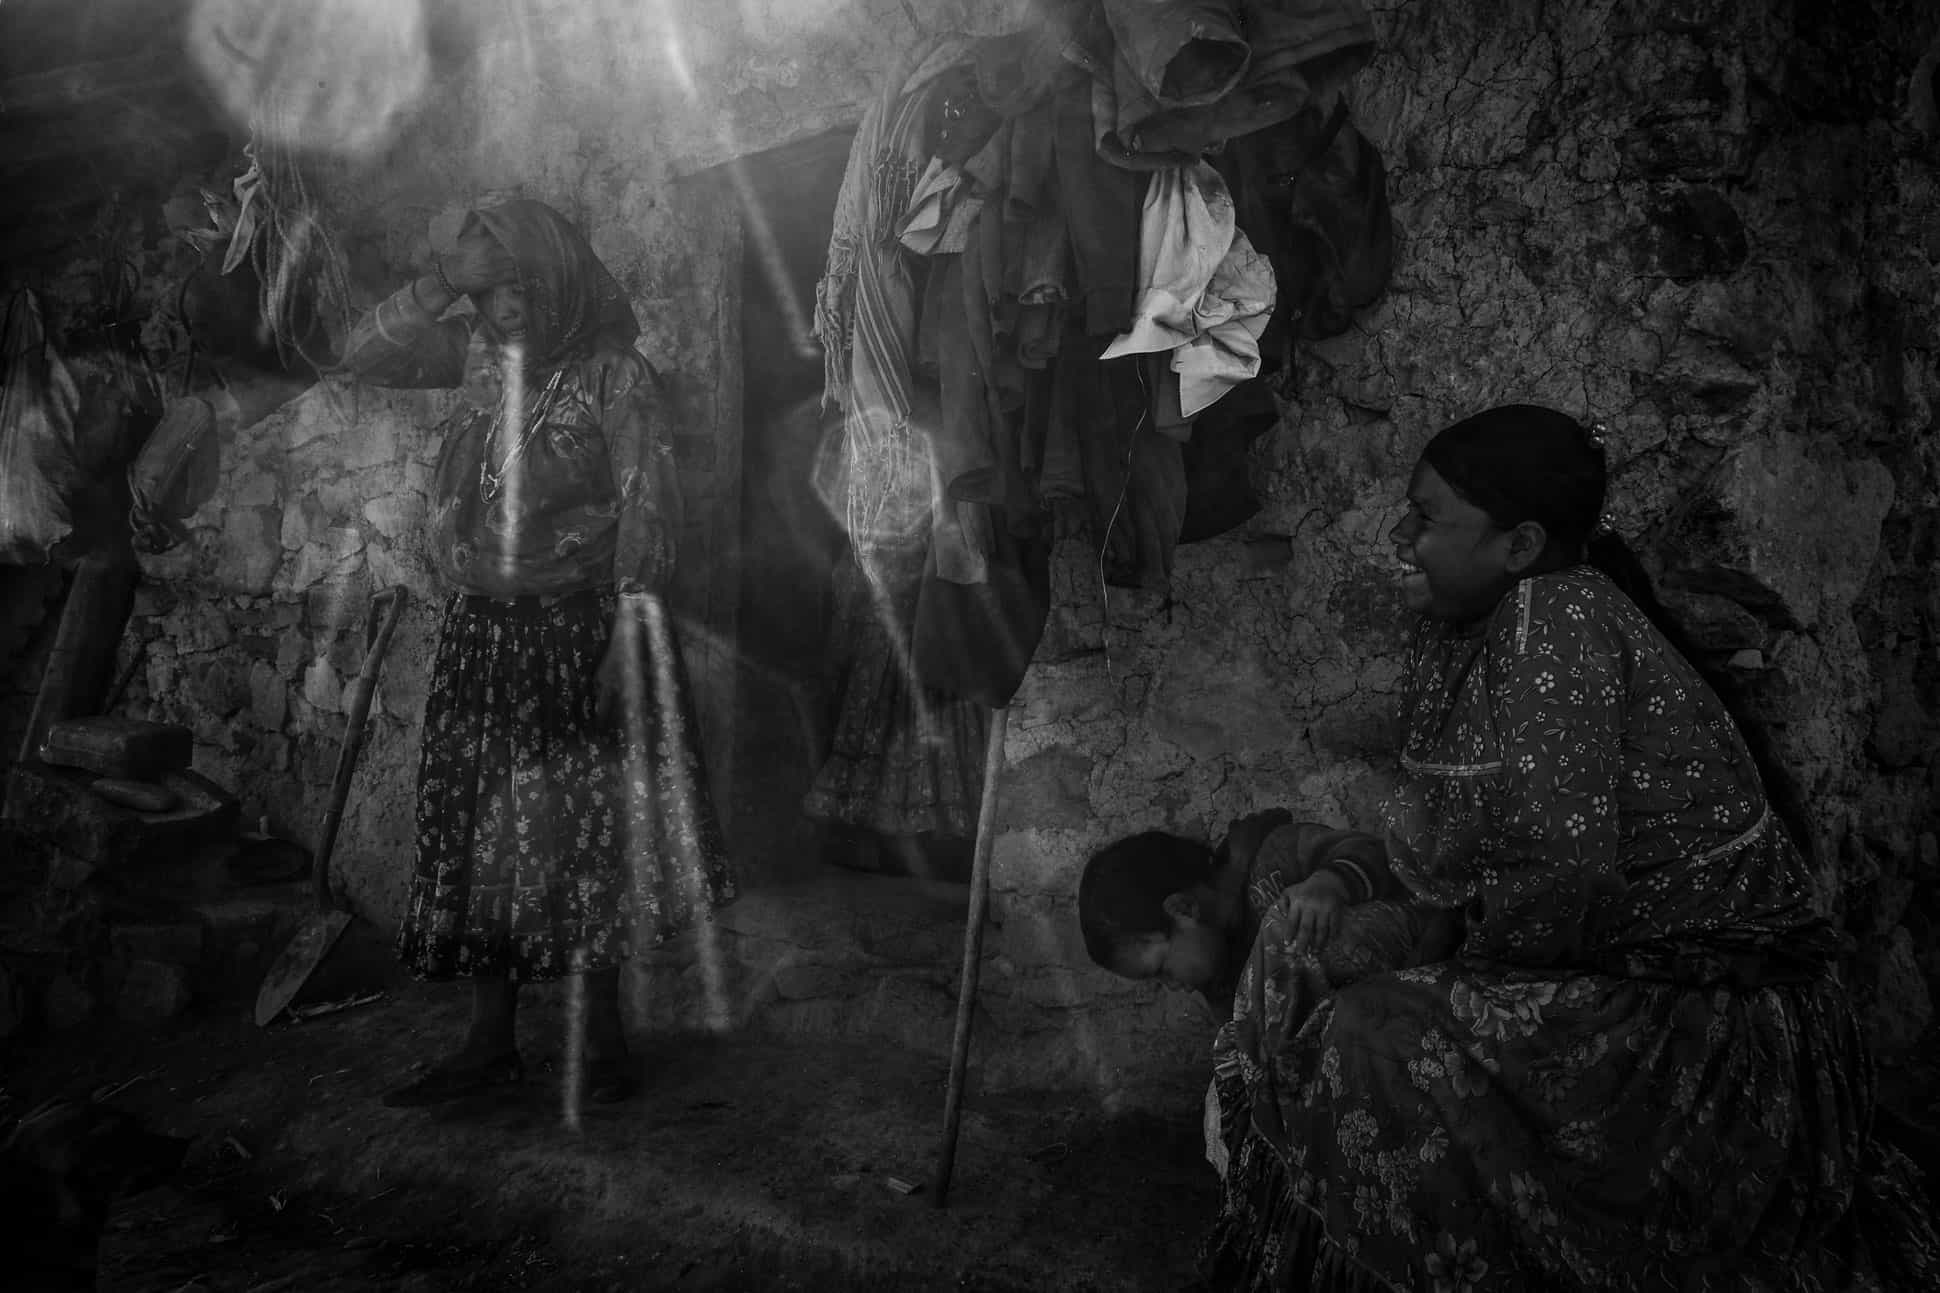 hambre-en-la-tarahumara-nicola-okin-gatopardo-213-mexico-nueva-decada-jla-12